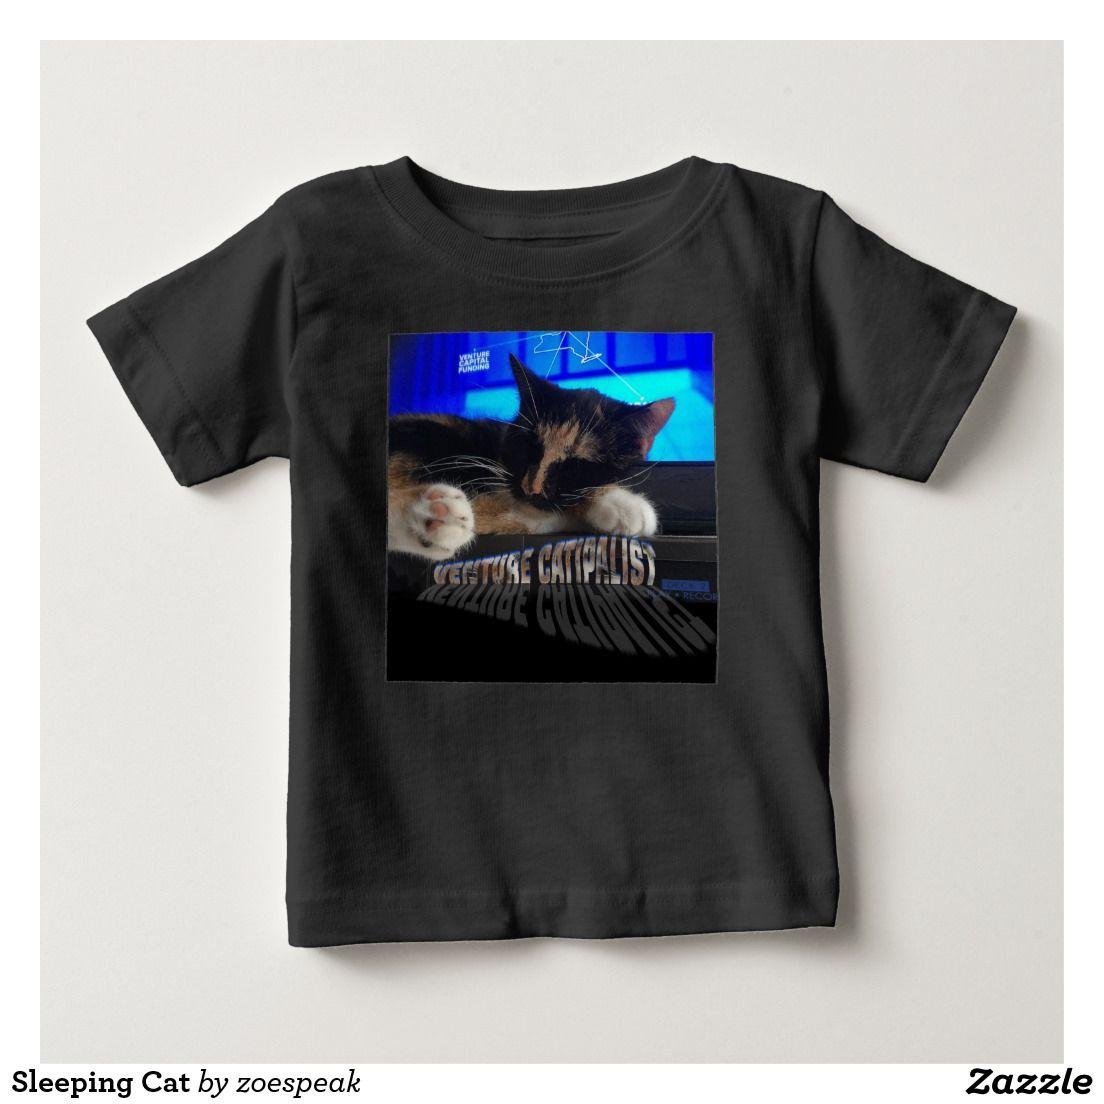 Venture Catipalist Sleeping Cat Baby T-shirt from ZoeSPEAK.